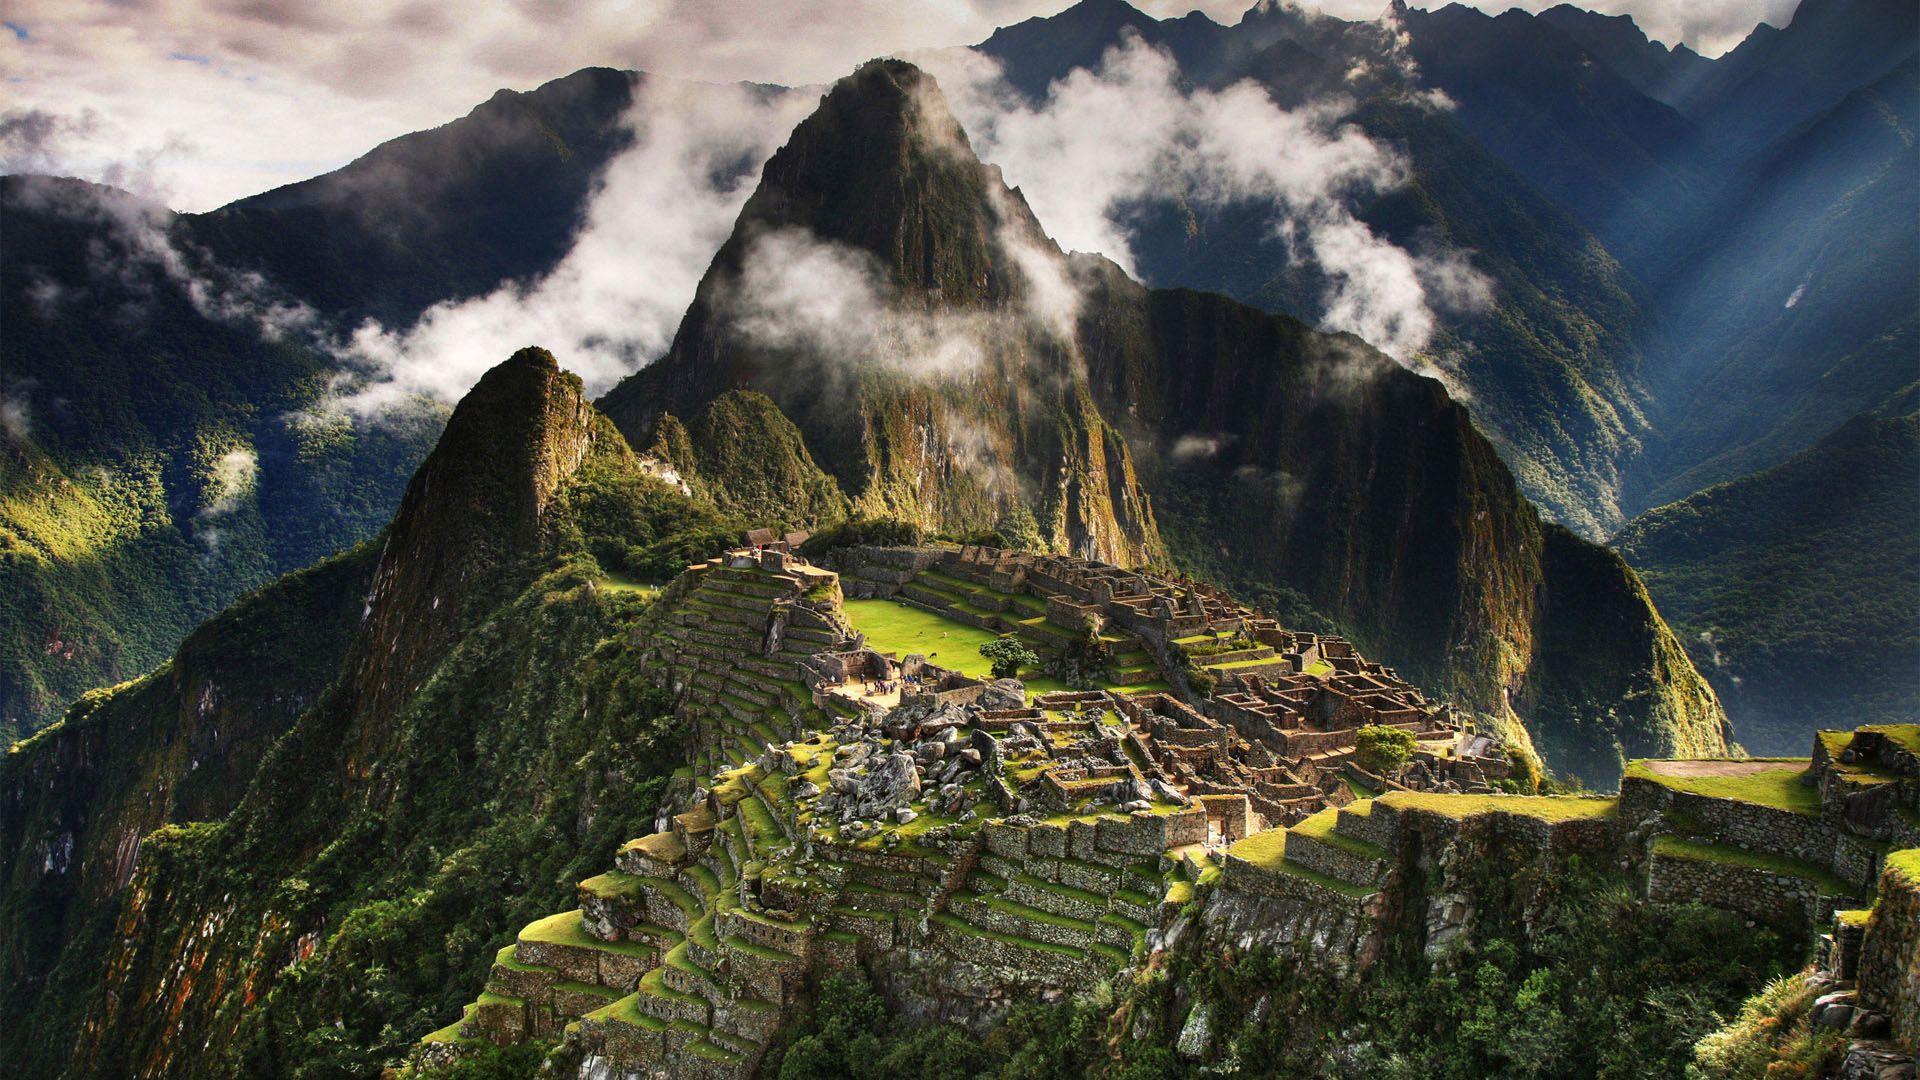 Peru - Machu Picchu http://www.vertrekdirect.nl/lastminutes/peru.html?utm_source=pinterest&utm_medium=textlink&utm_campaign=socialmedia